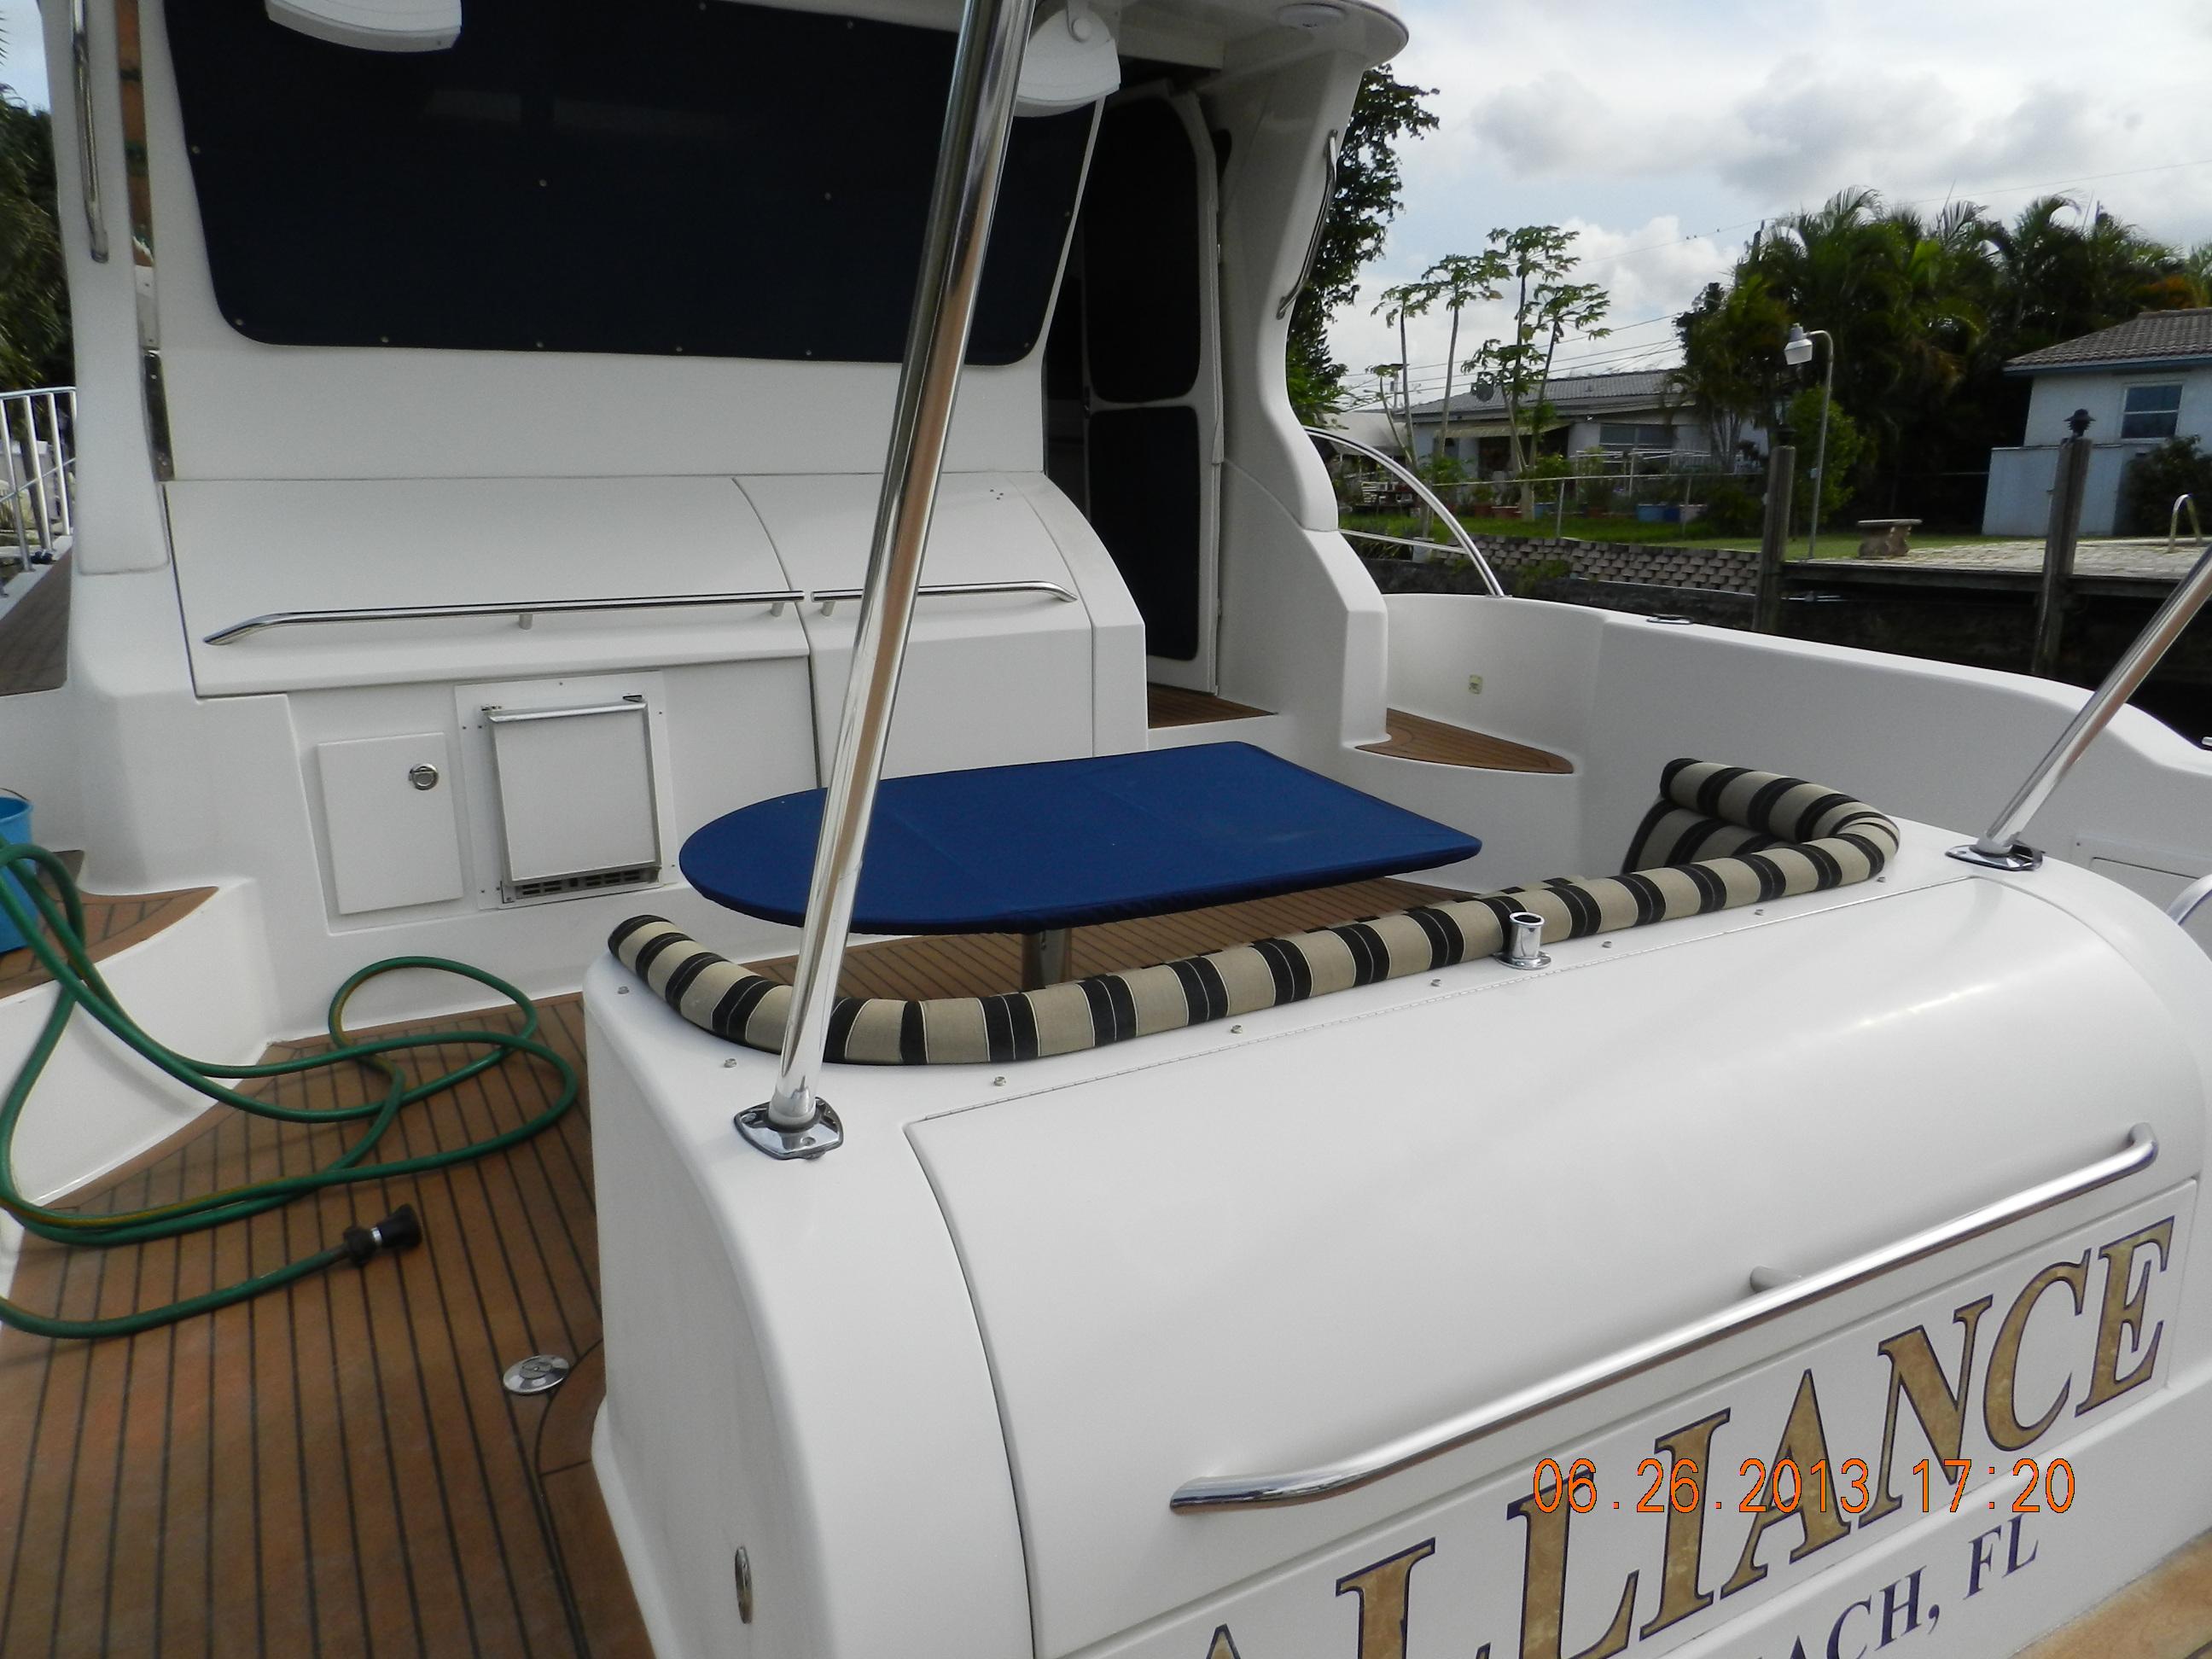 Alliance_yacht_June_2013 010